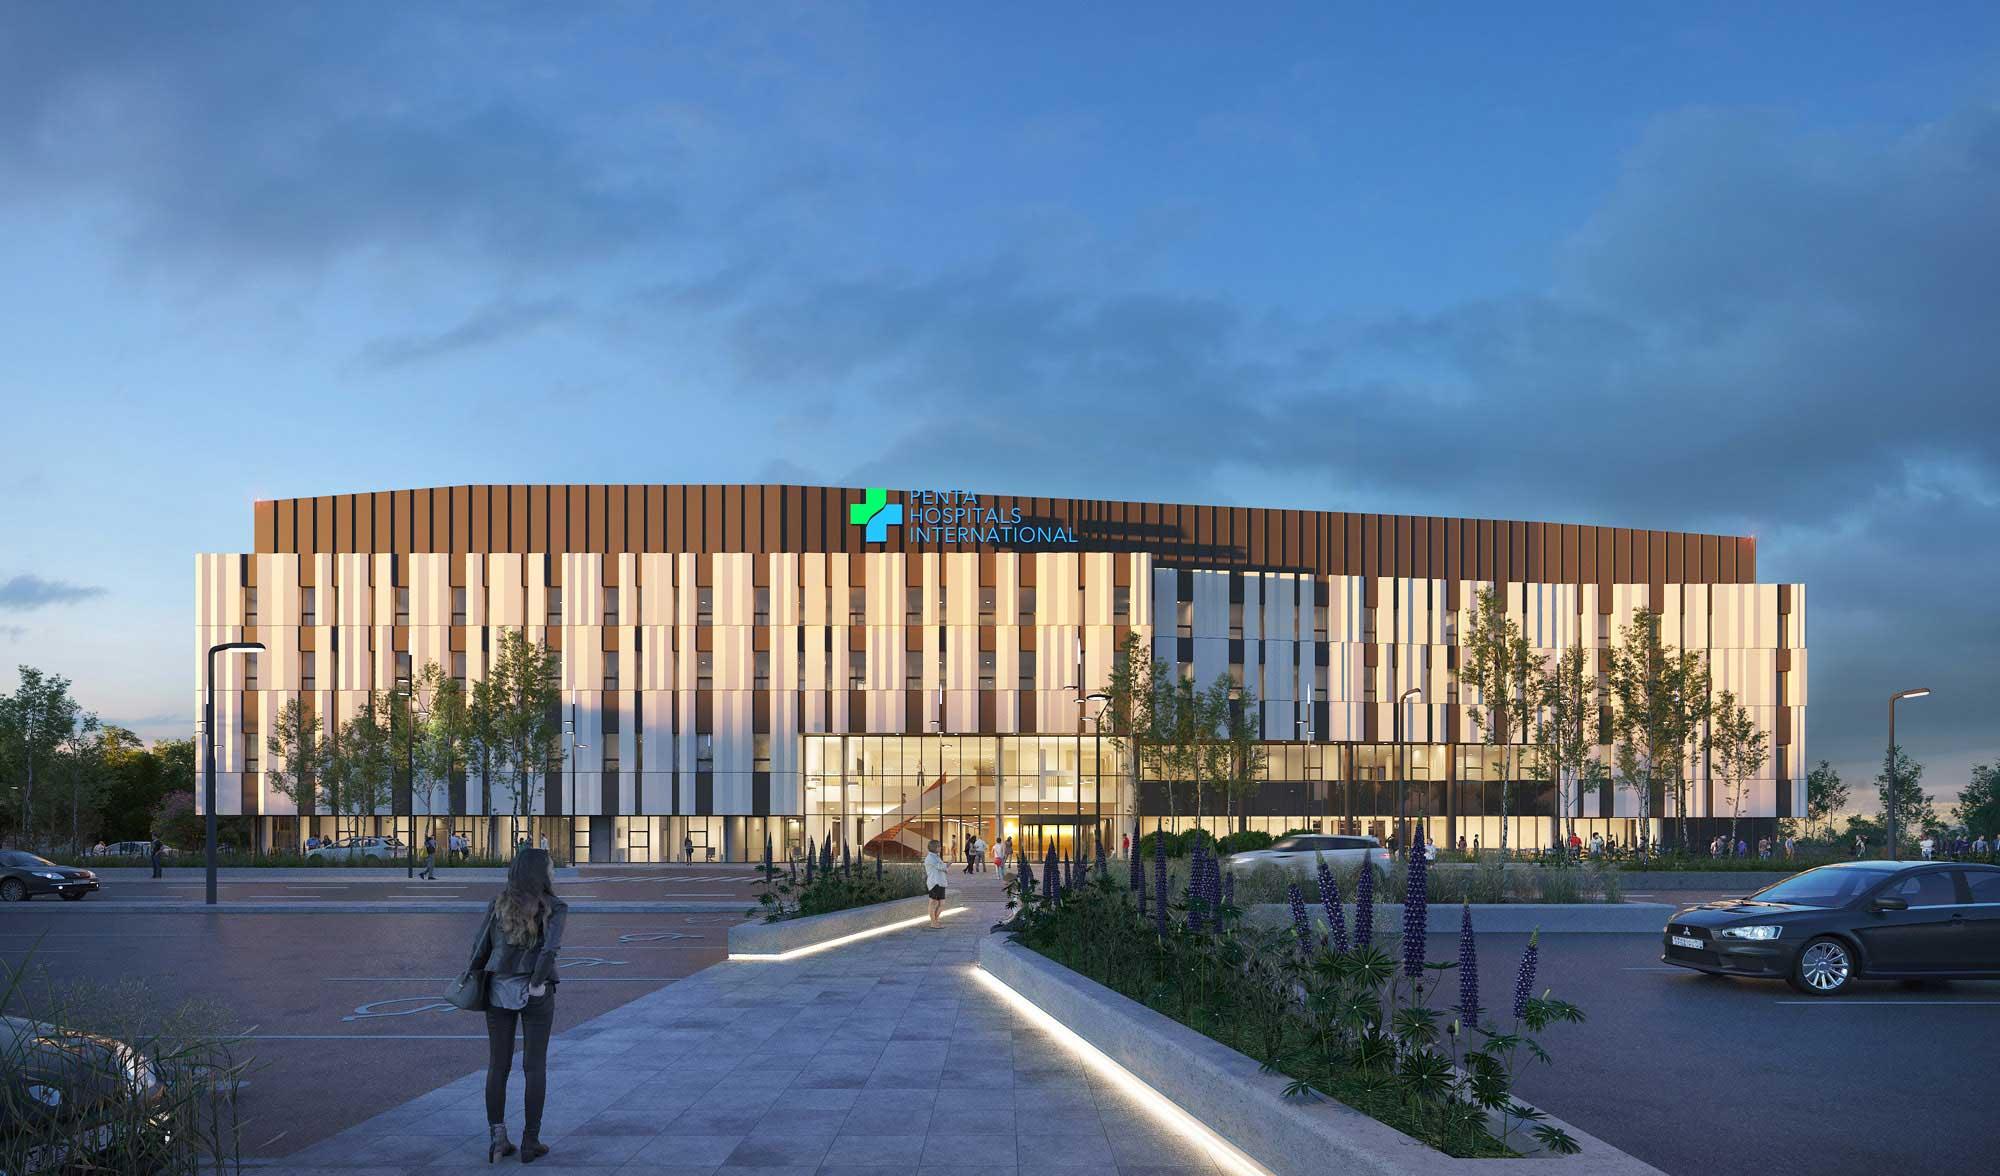 Next Generation Hospital, Bratislava, Slovakia